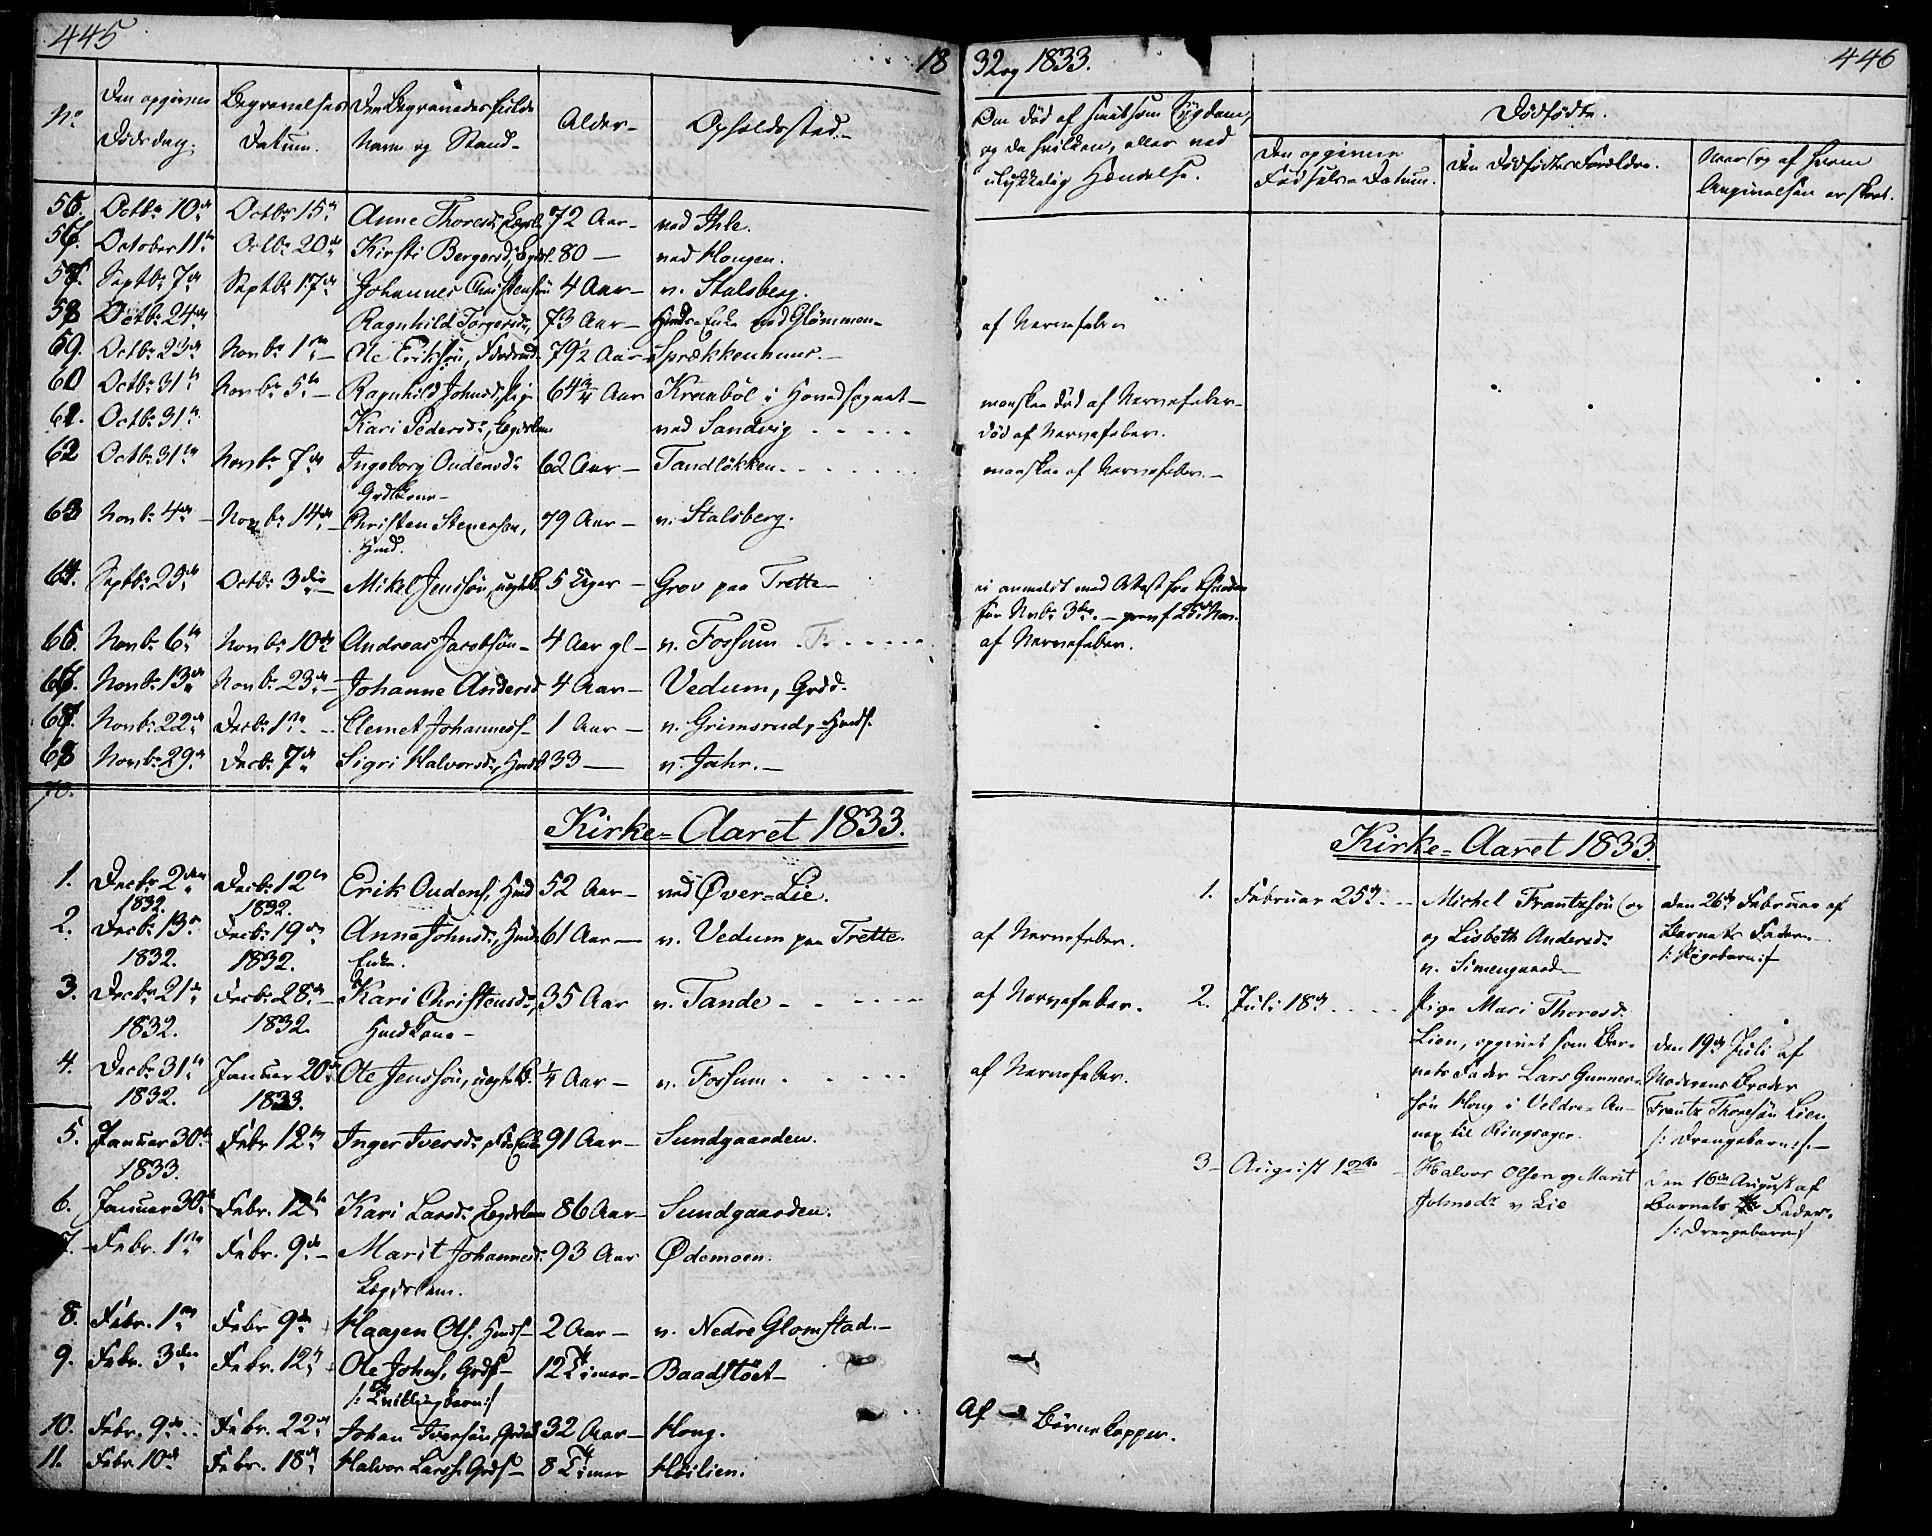 SAH, Øyer prestekontor, Ministerialbok nr. 4, 1824-1841, s. 445-446